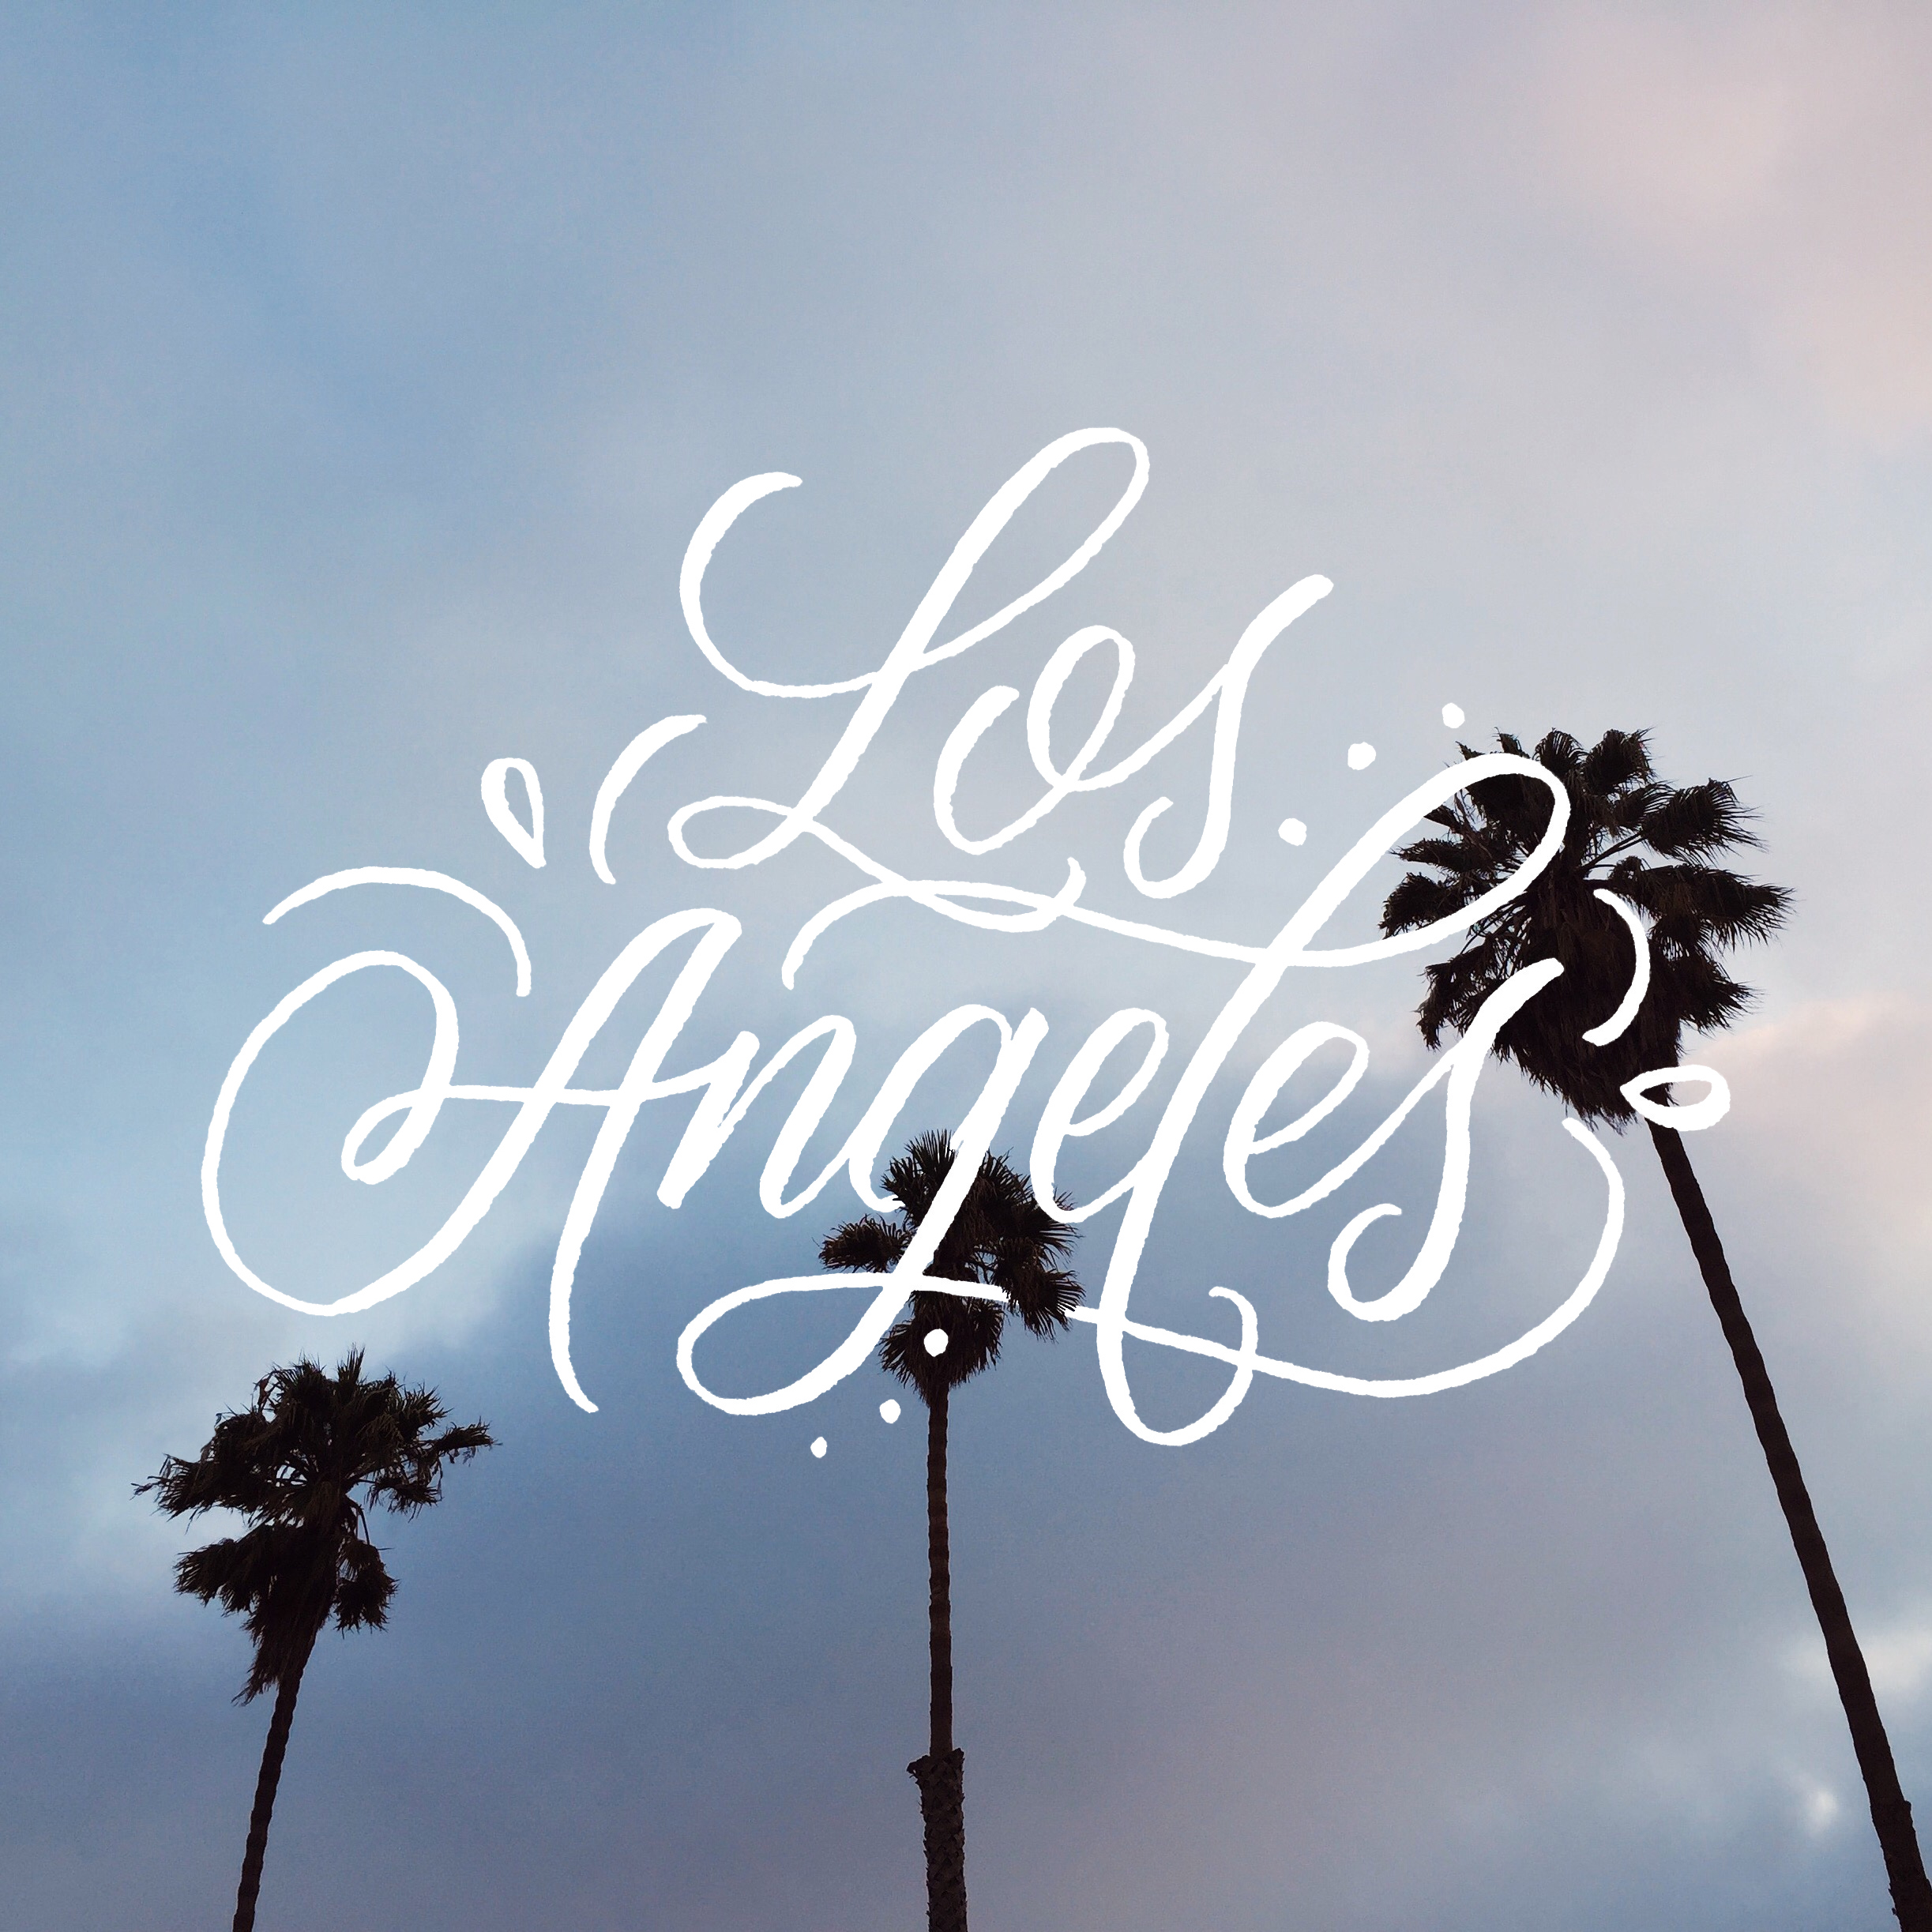 Los Angeles - Lettering by Wink & Wonder